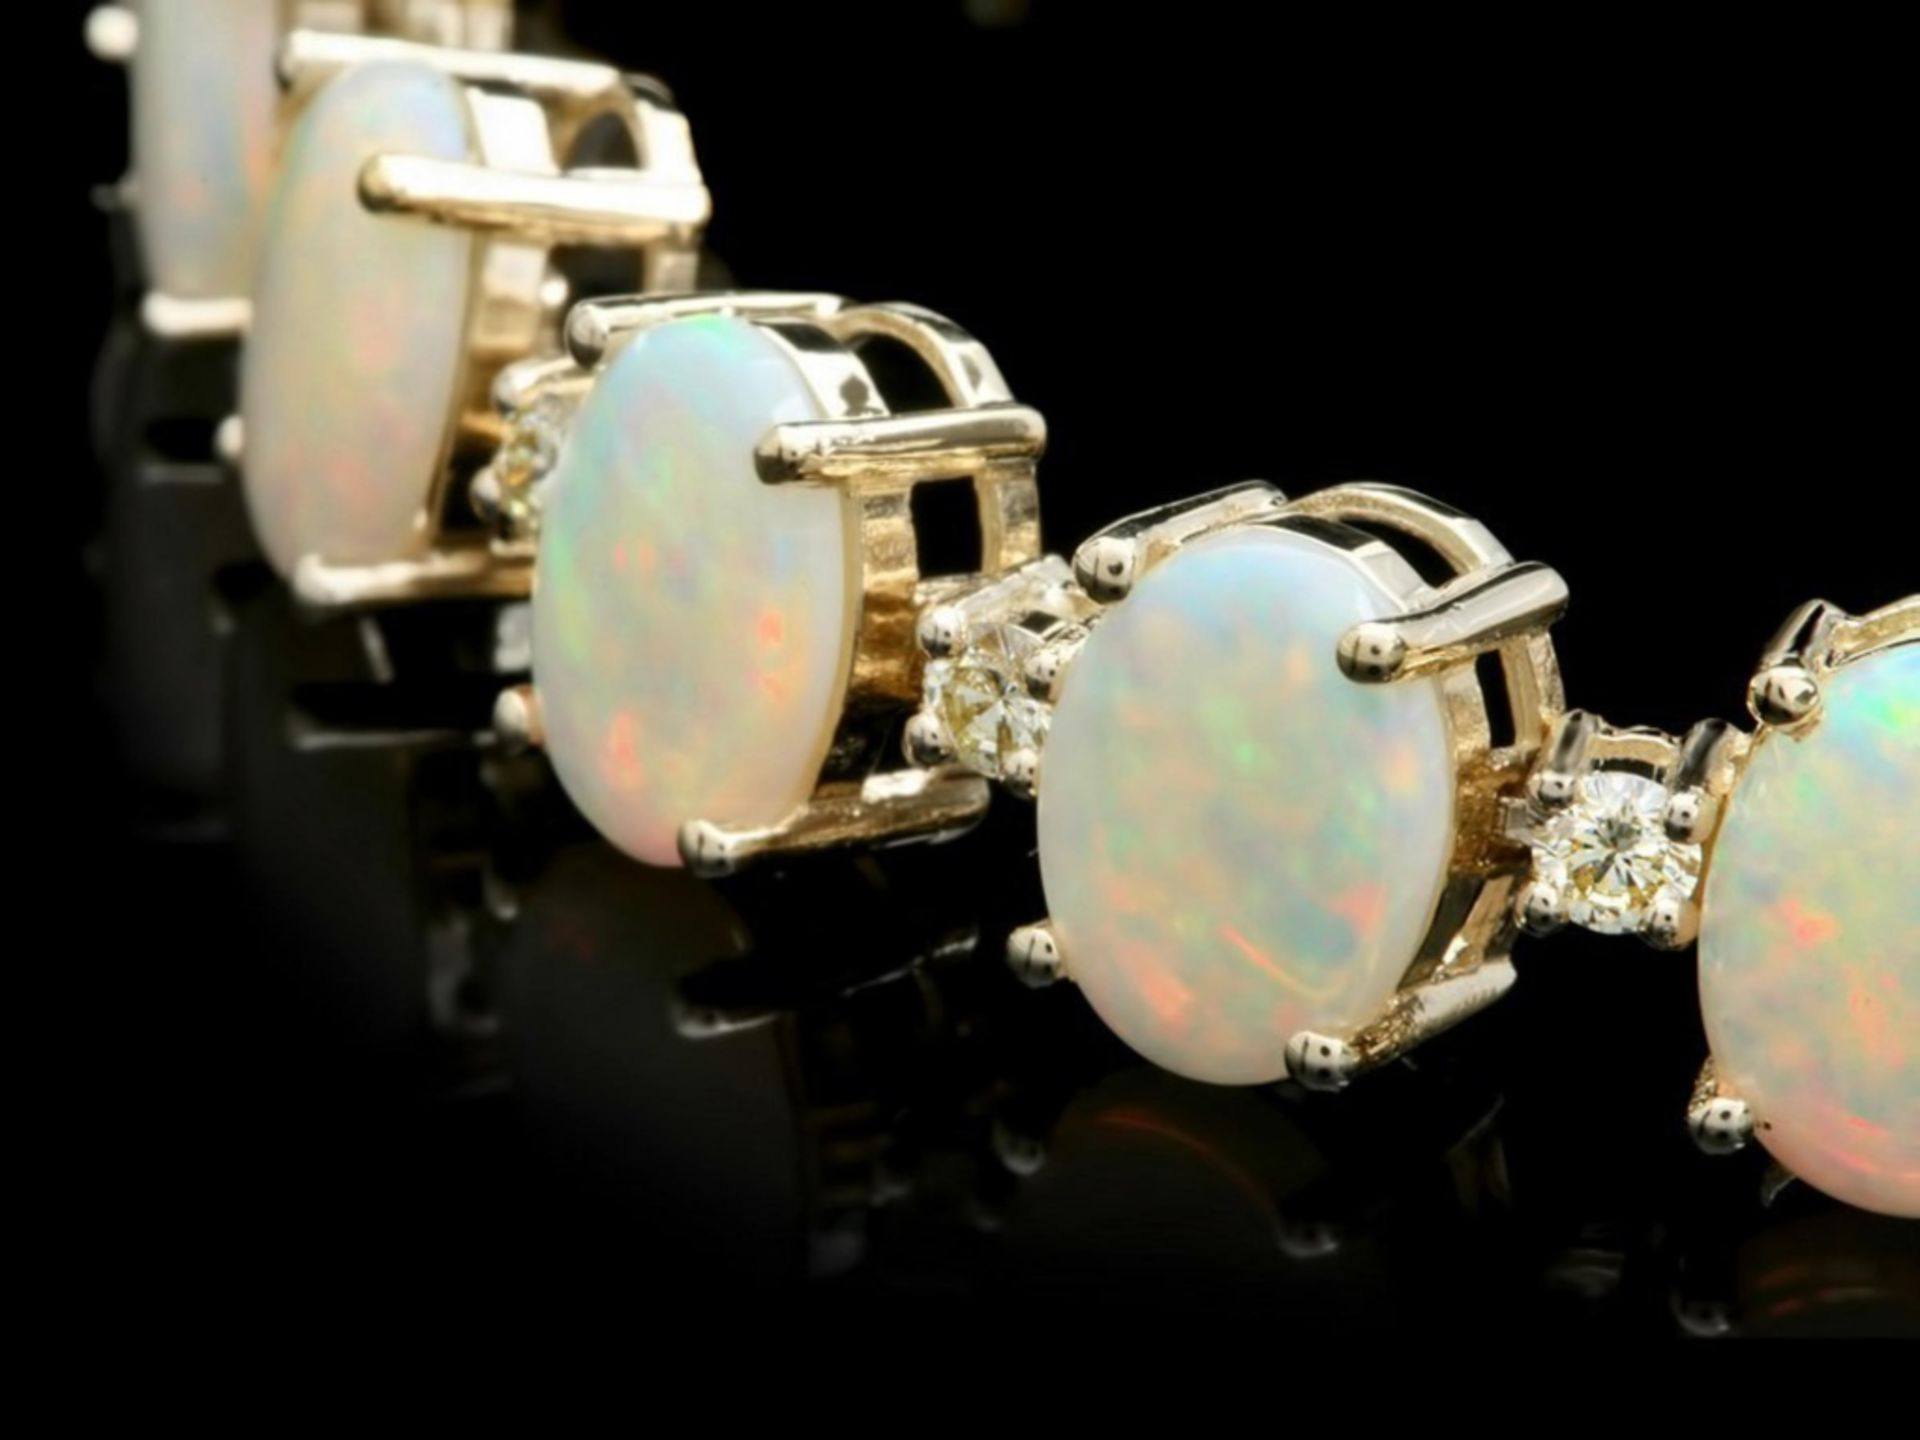 `14k Gold 18.00ct Opal & 1.45ct Diamond Bracelet - Image 2 of 3